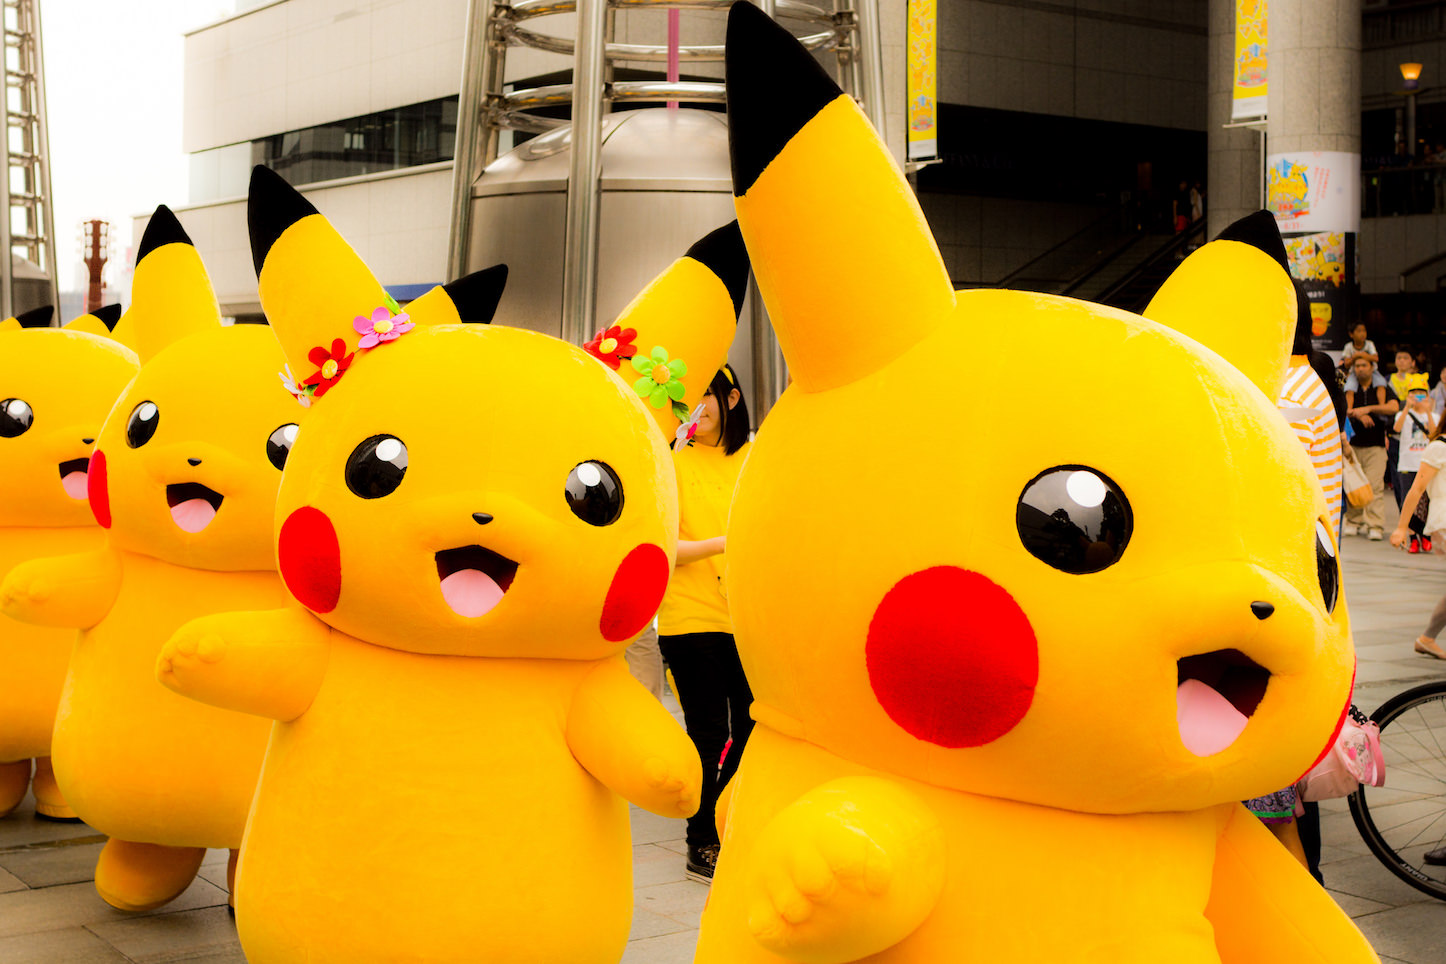 lots-of-pikachu-walking-around.jpg